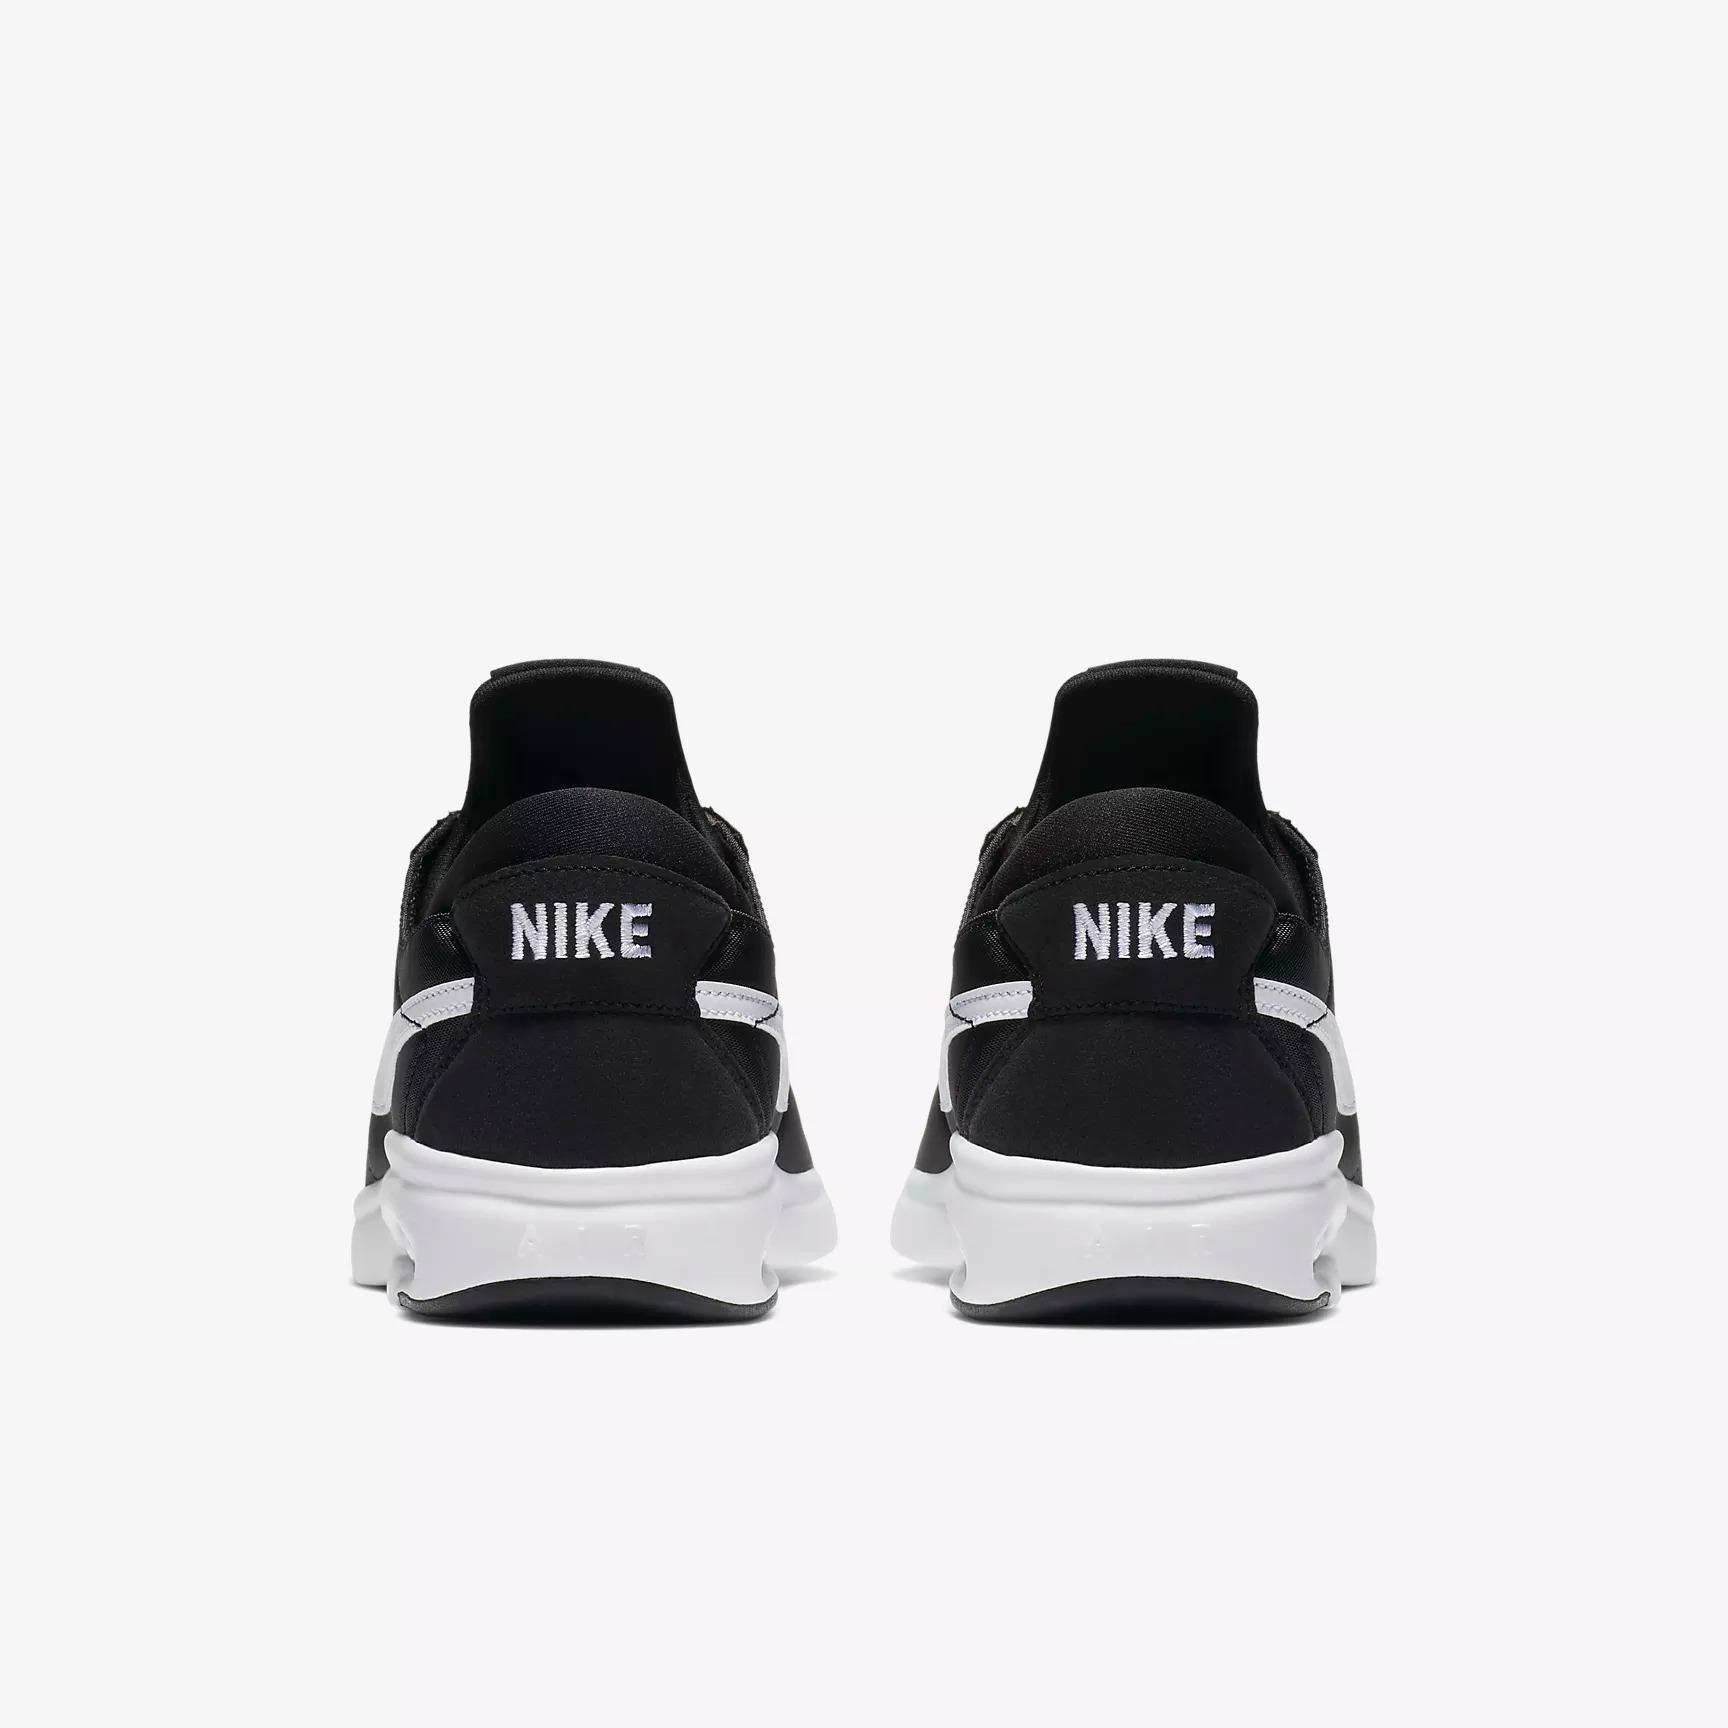 21e237b5b59 Nike SB Air Max Bruin Vapor TXT Sneakers - SPORT SHOES Lifestyle ...